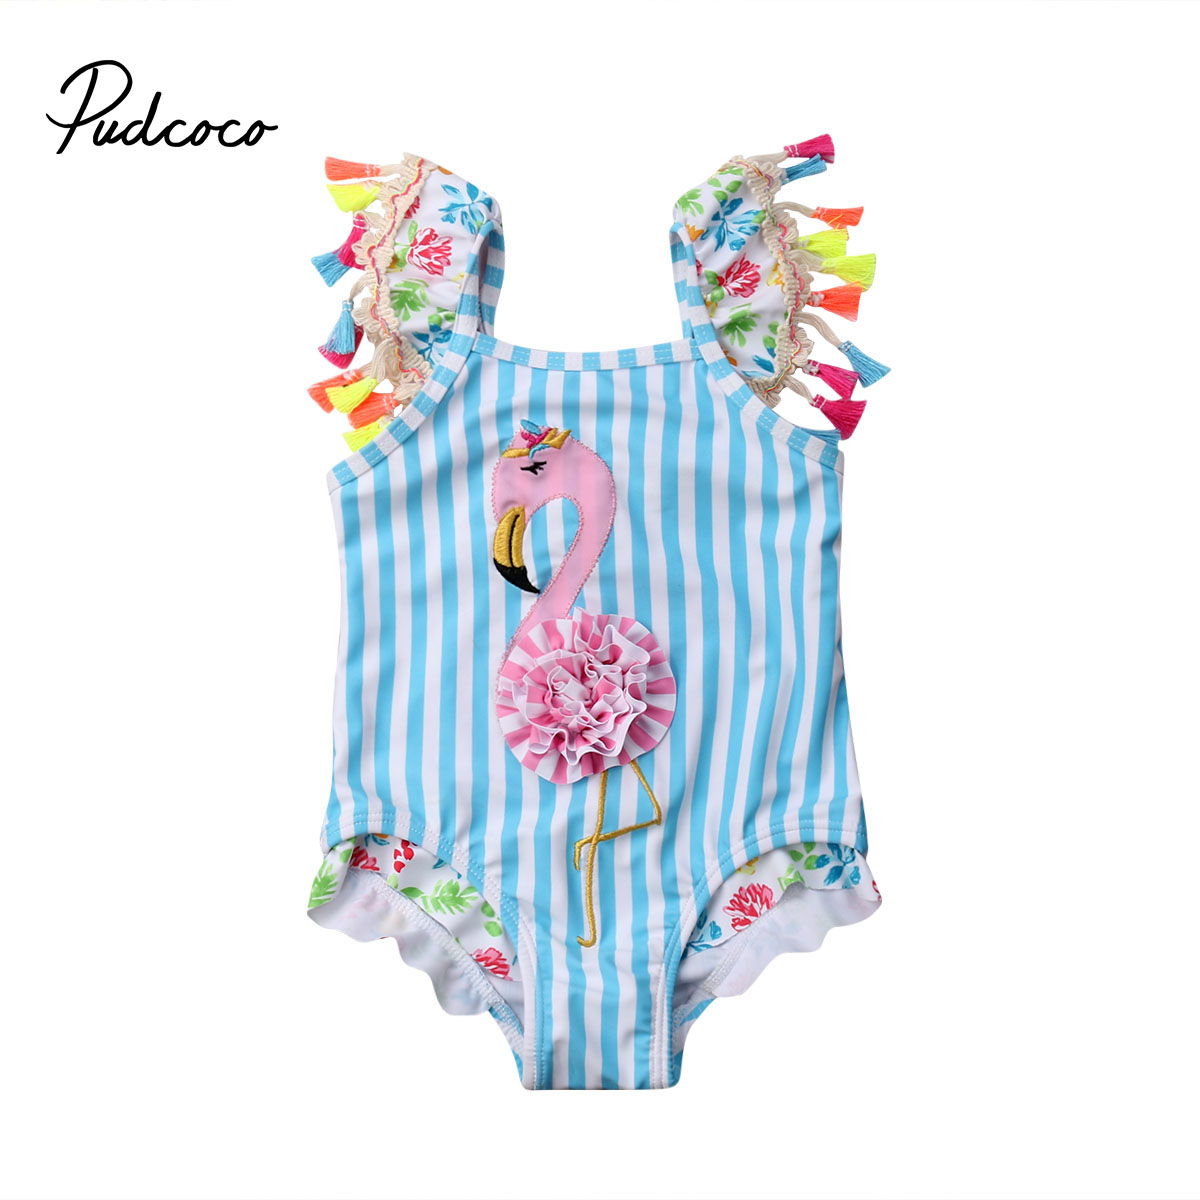 6M 5T Flamingo Girls Kids Swimsuit Cartoon Bathing Suit Print Children Swimwear Bikini Tankini -1338